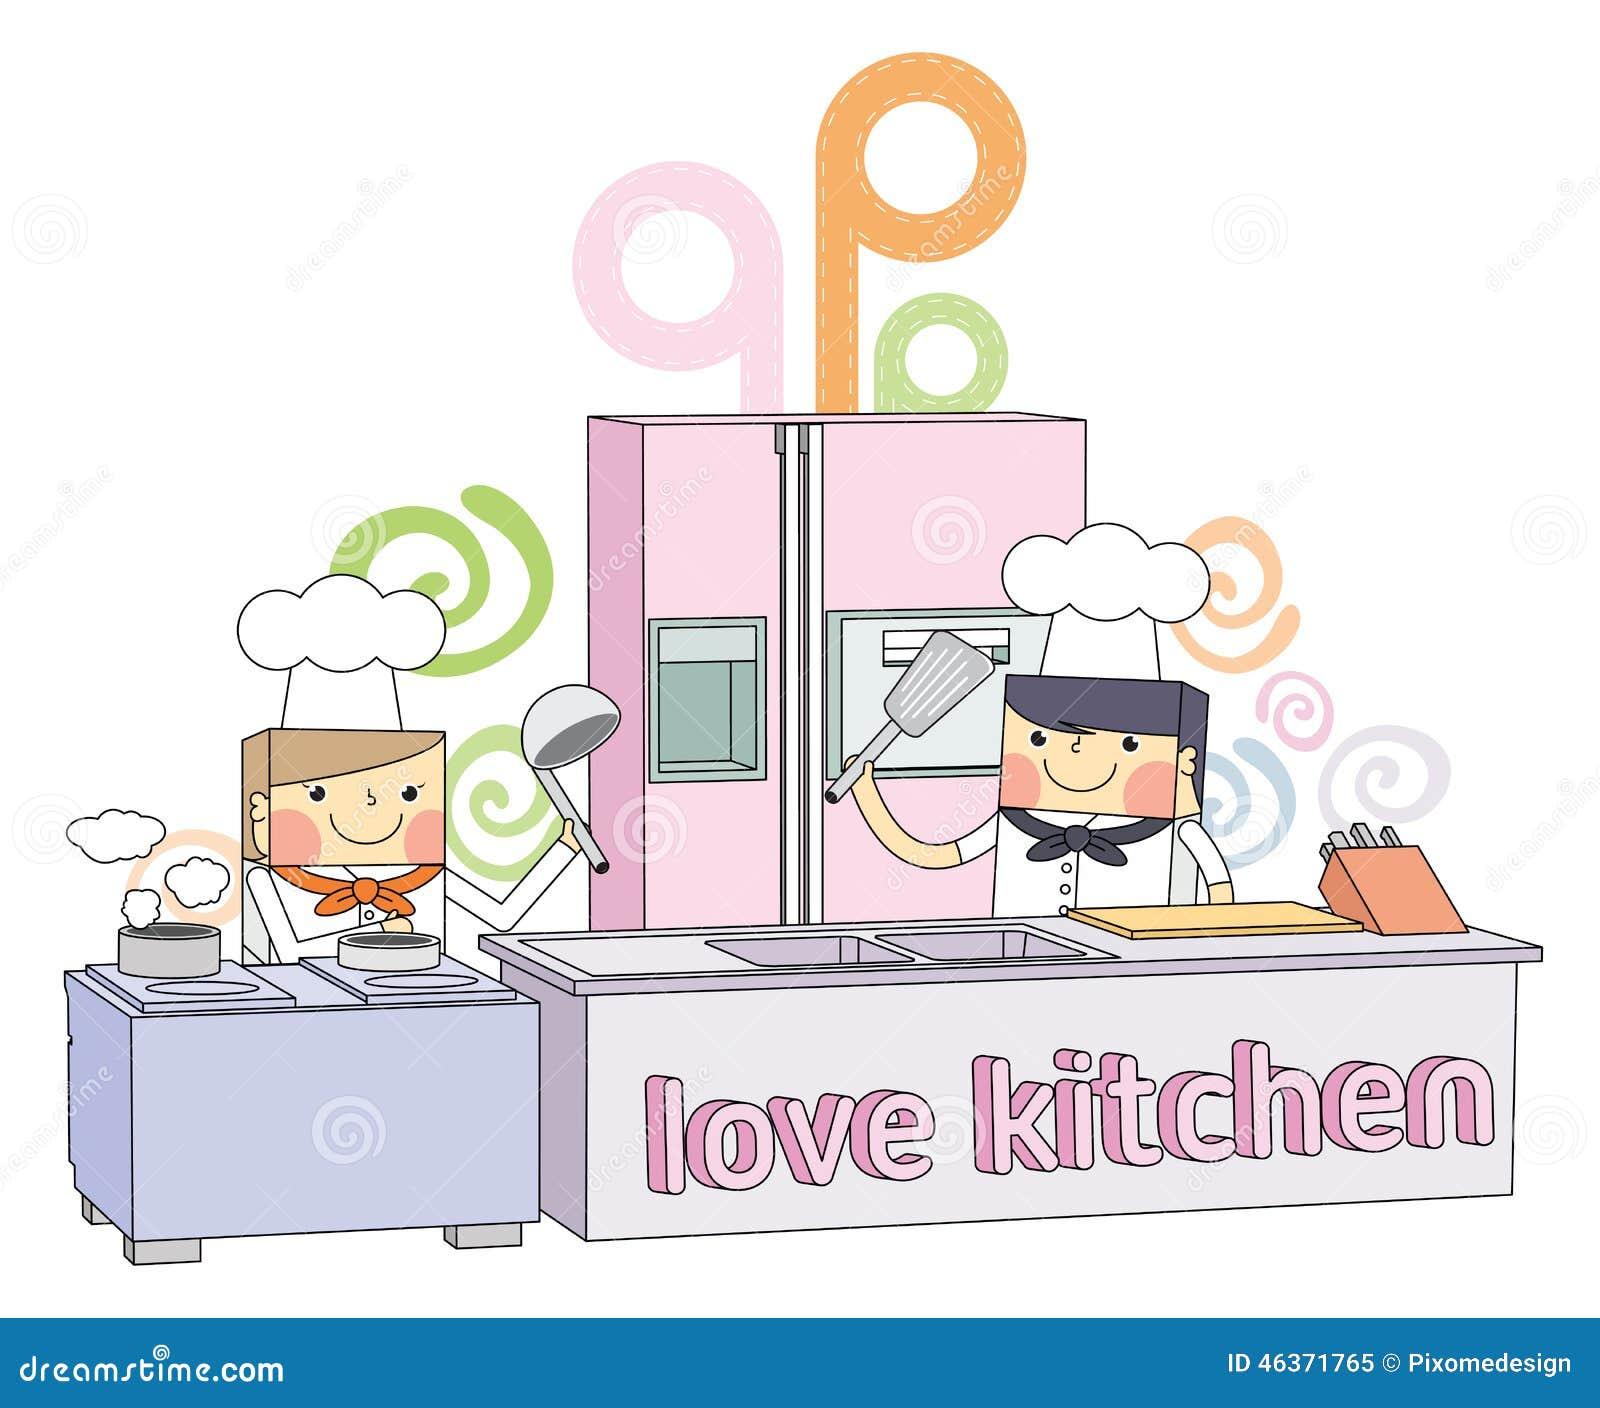 Restaurant Kitchen Illustration restaurant kitchen chef line character illustration stock vector